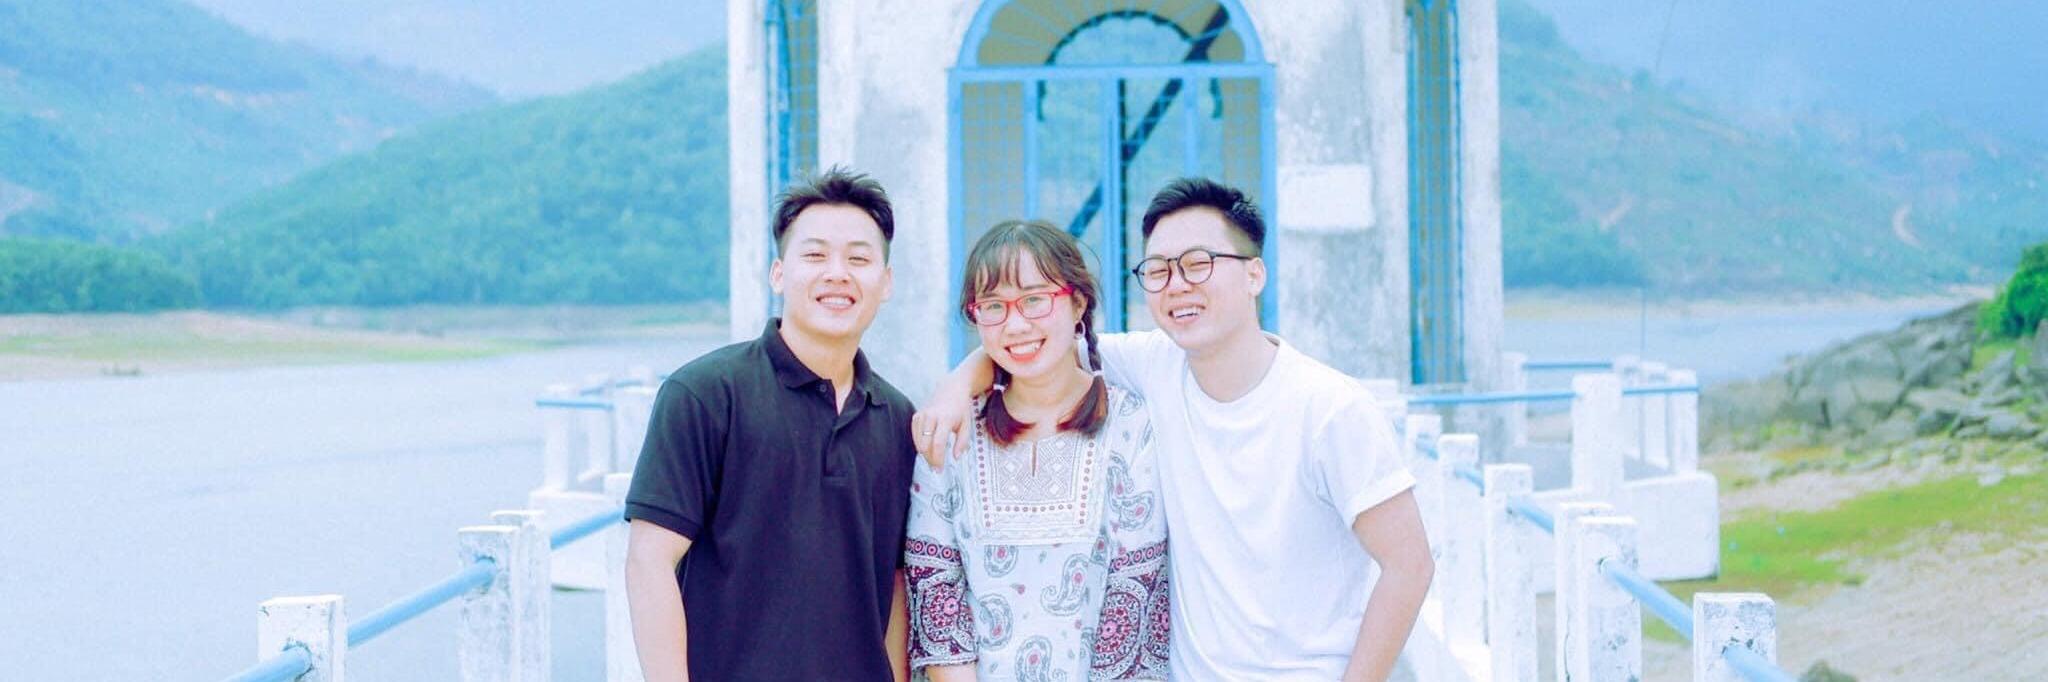 https://gody.vn/blog/congchua_mauhong803174/post/dong-xanh-dong-nghe-cung-voi-nhung-nguoi-ban-de-thuong-8971